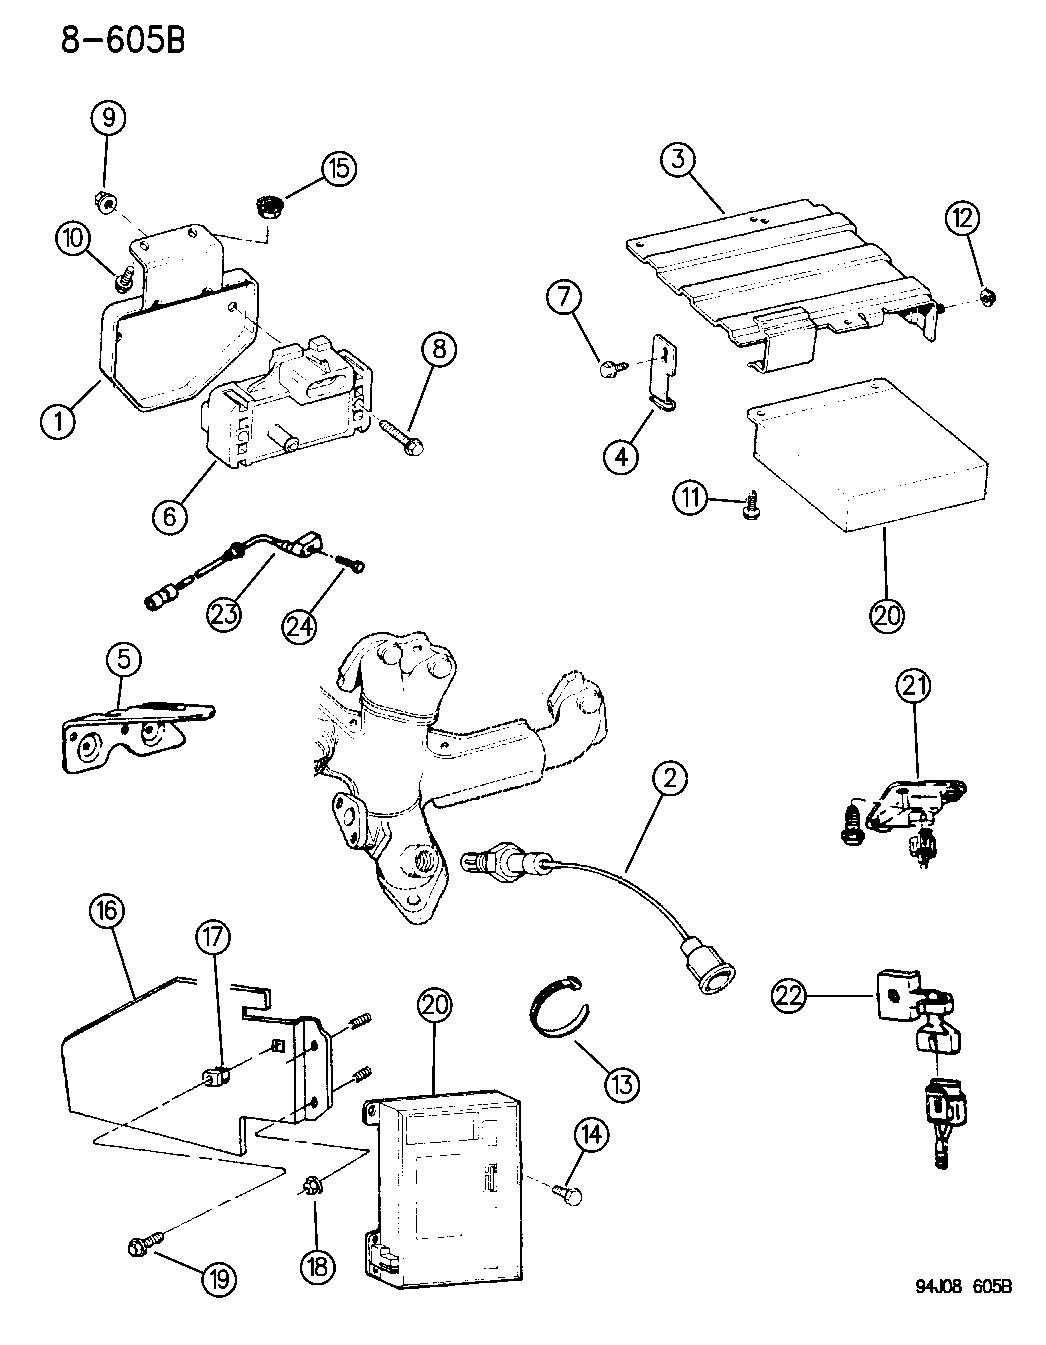 97 jeep cherokee throttle position sensor diagram 4761871ab genuine mopar sensr throttle position  genuine mopar sensr throttle position